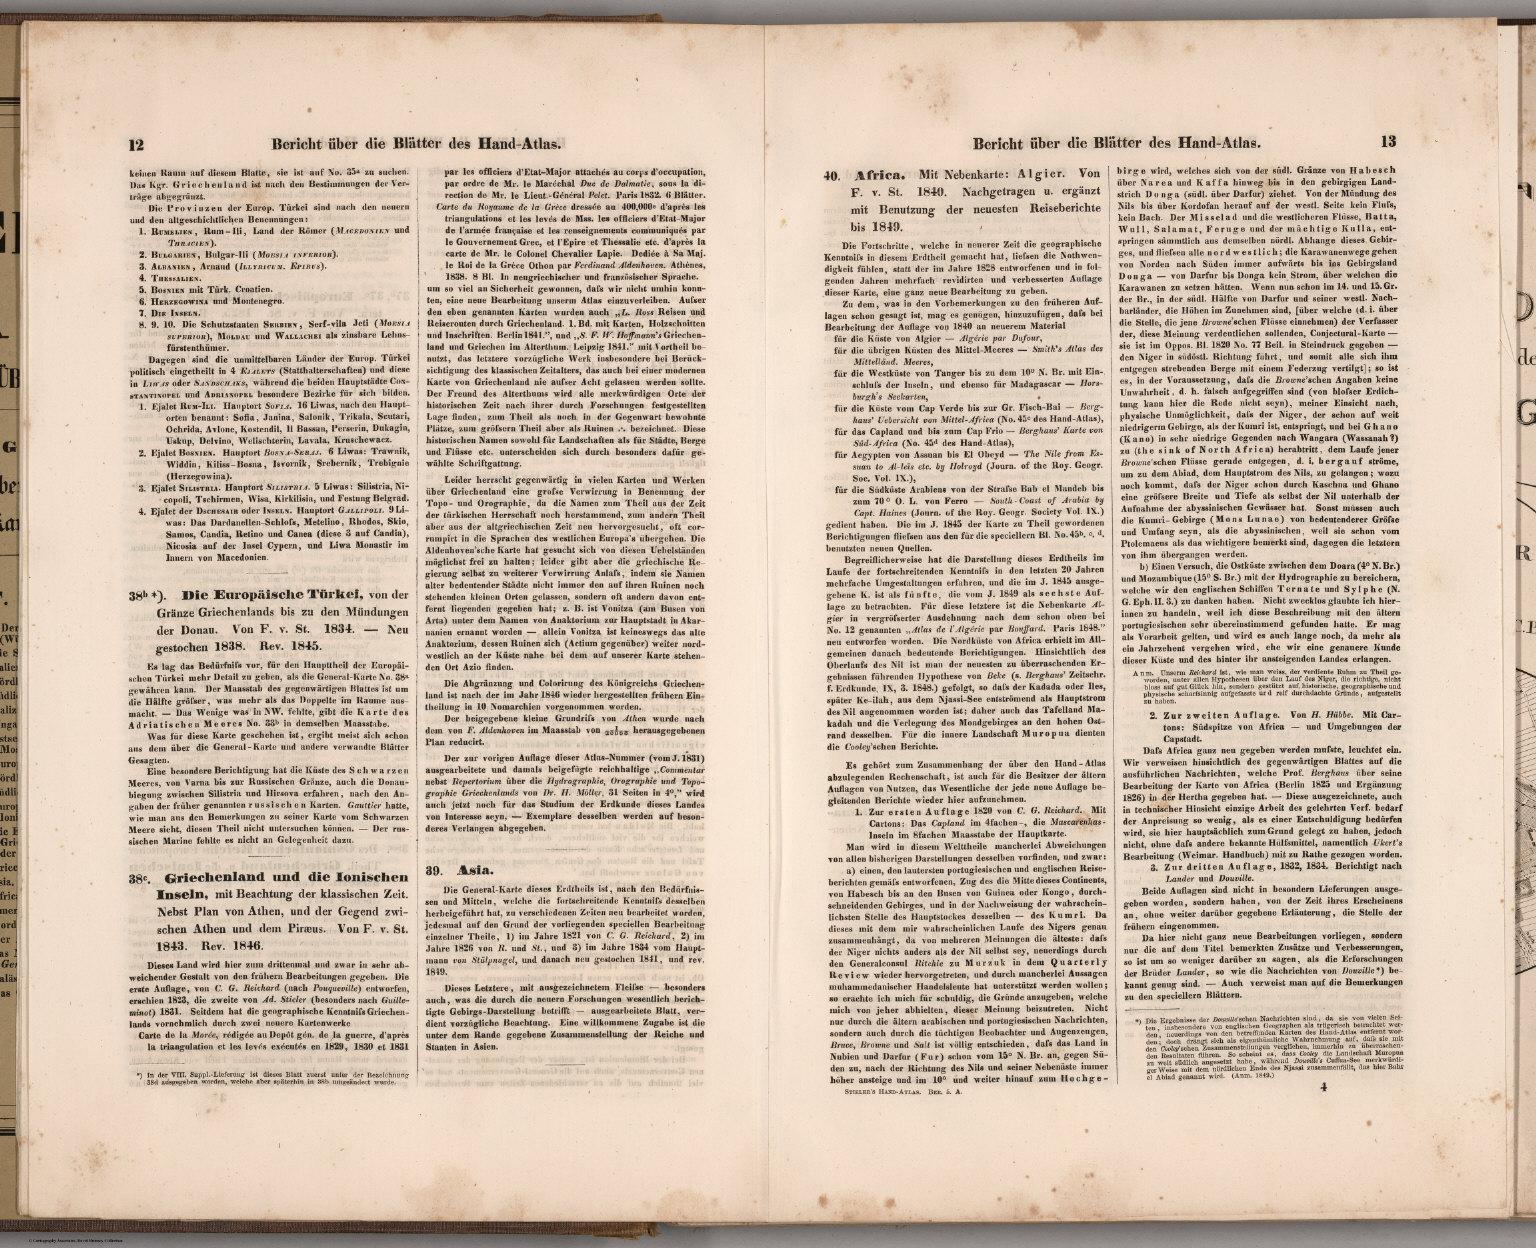 Text: (Description of Maps 38a-40) Stieler's Hand-Atlas.